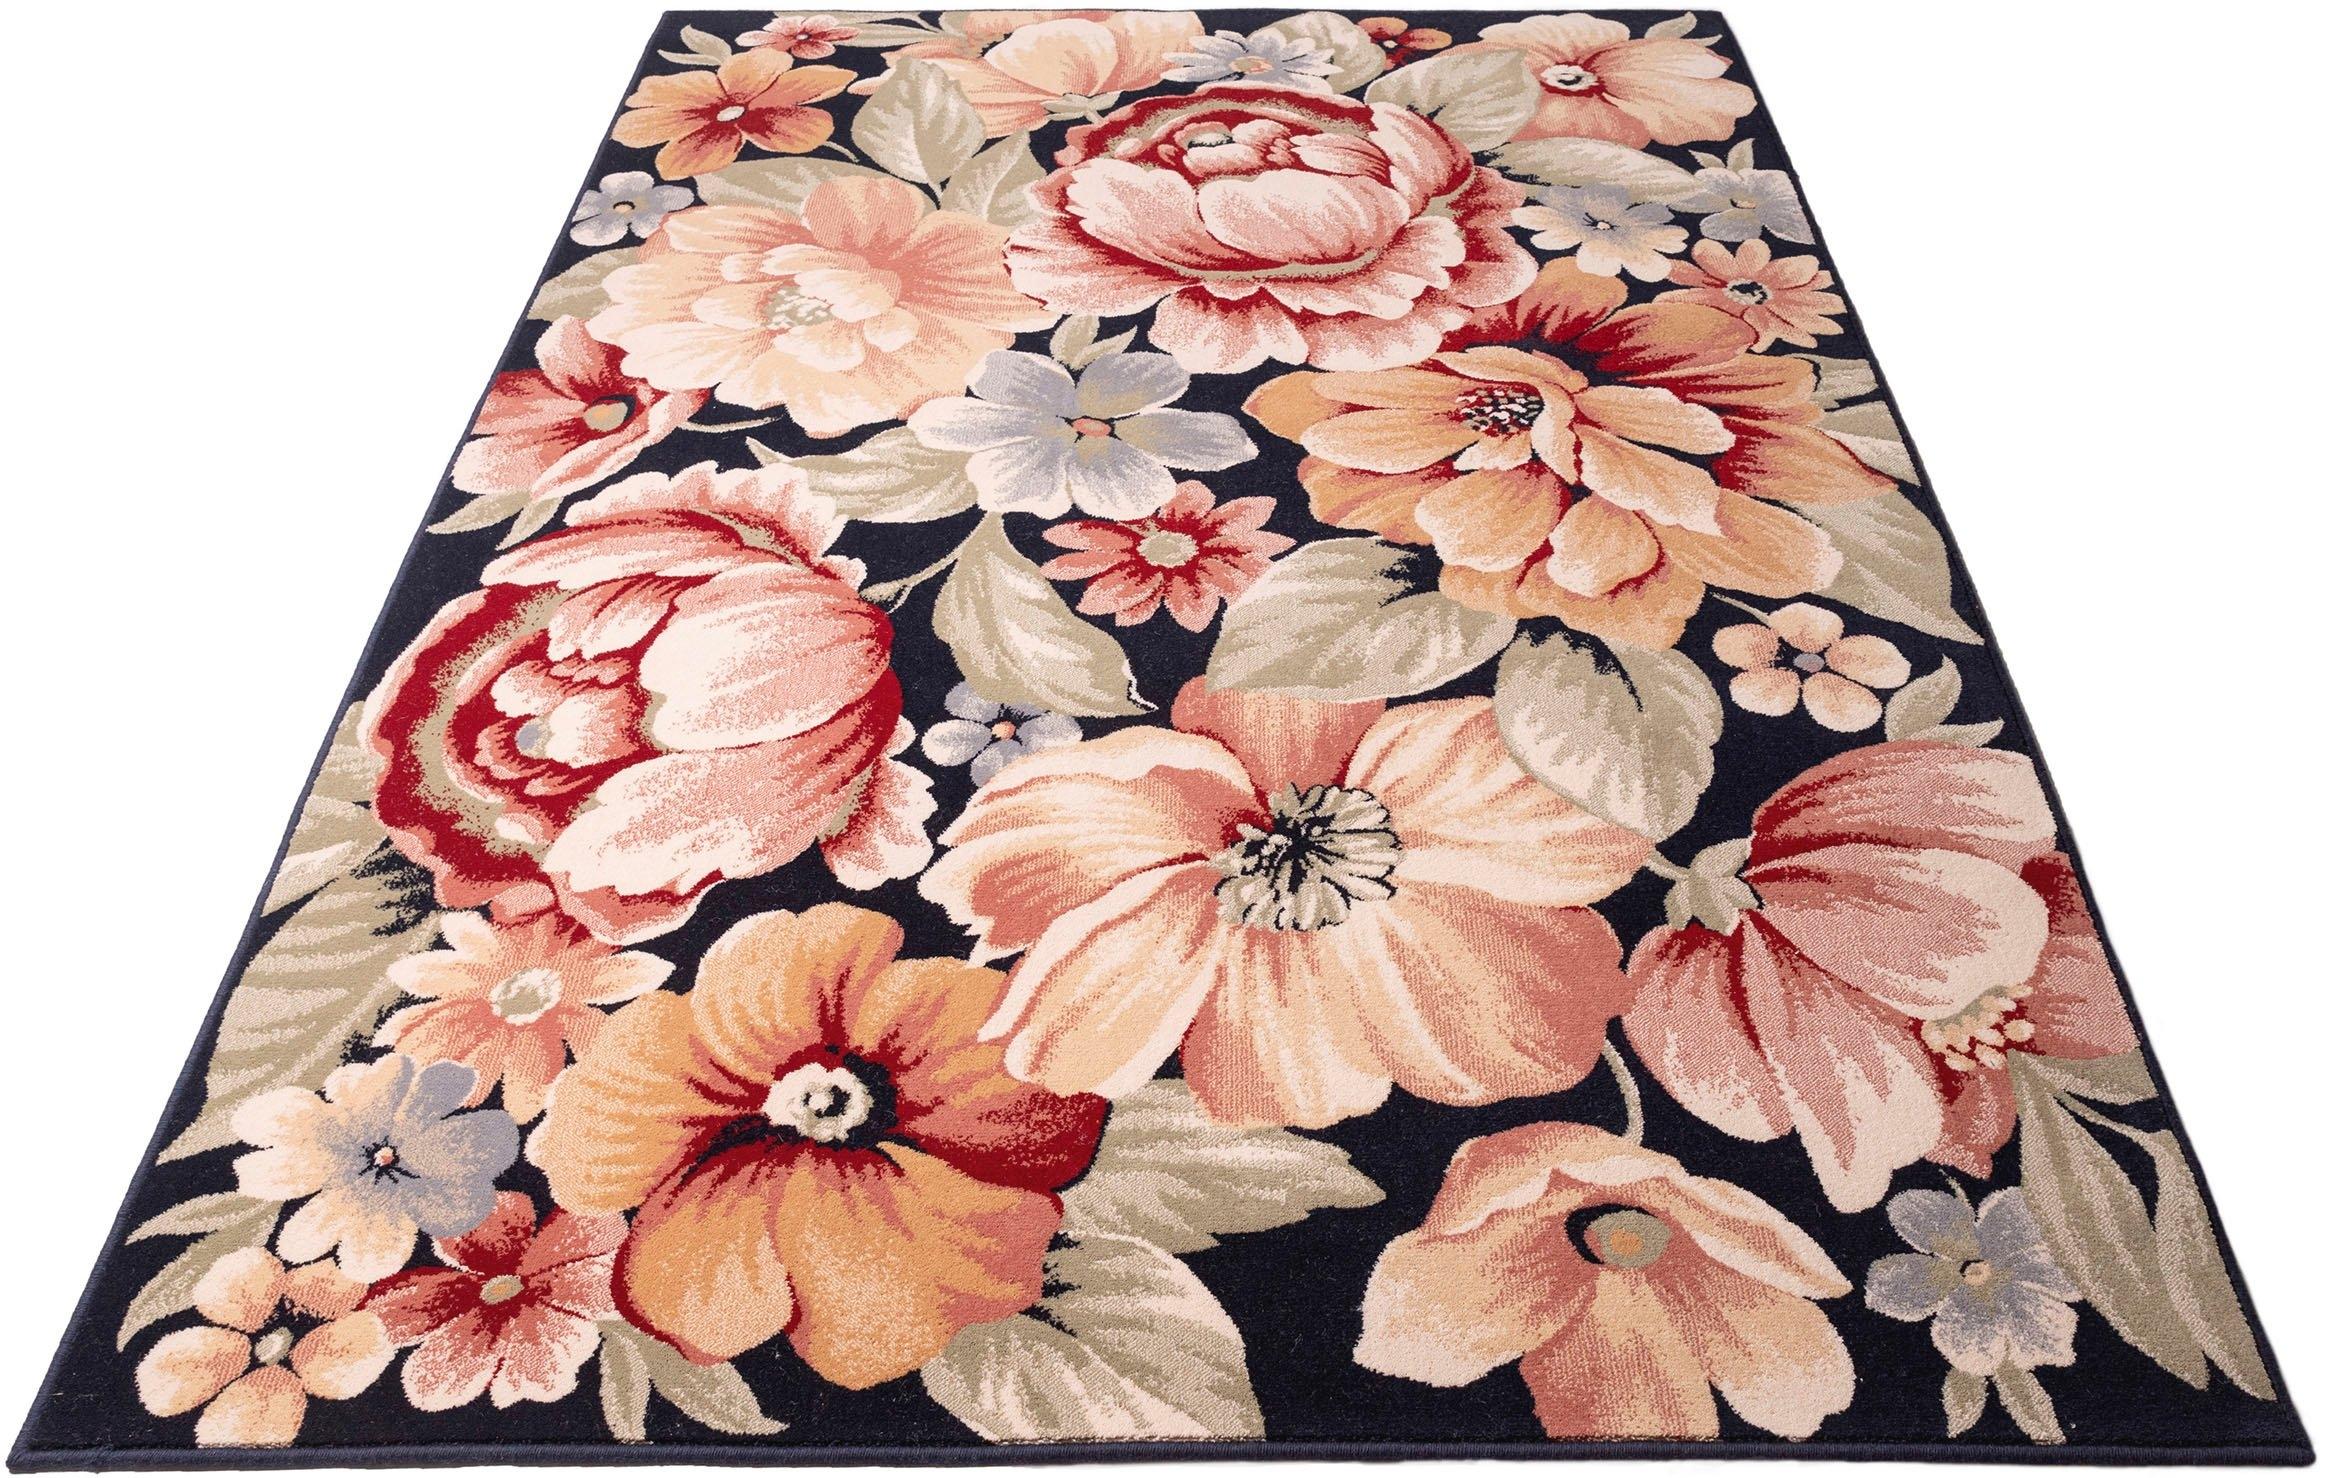 THEKO wollen kleed Floresti 7091 zuivere wol, woonkamer nu online kopen bij OTTO